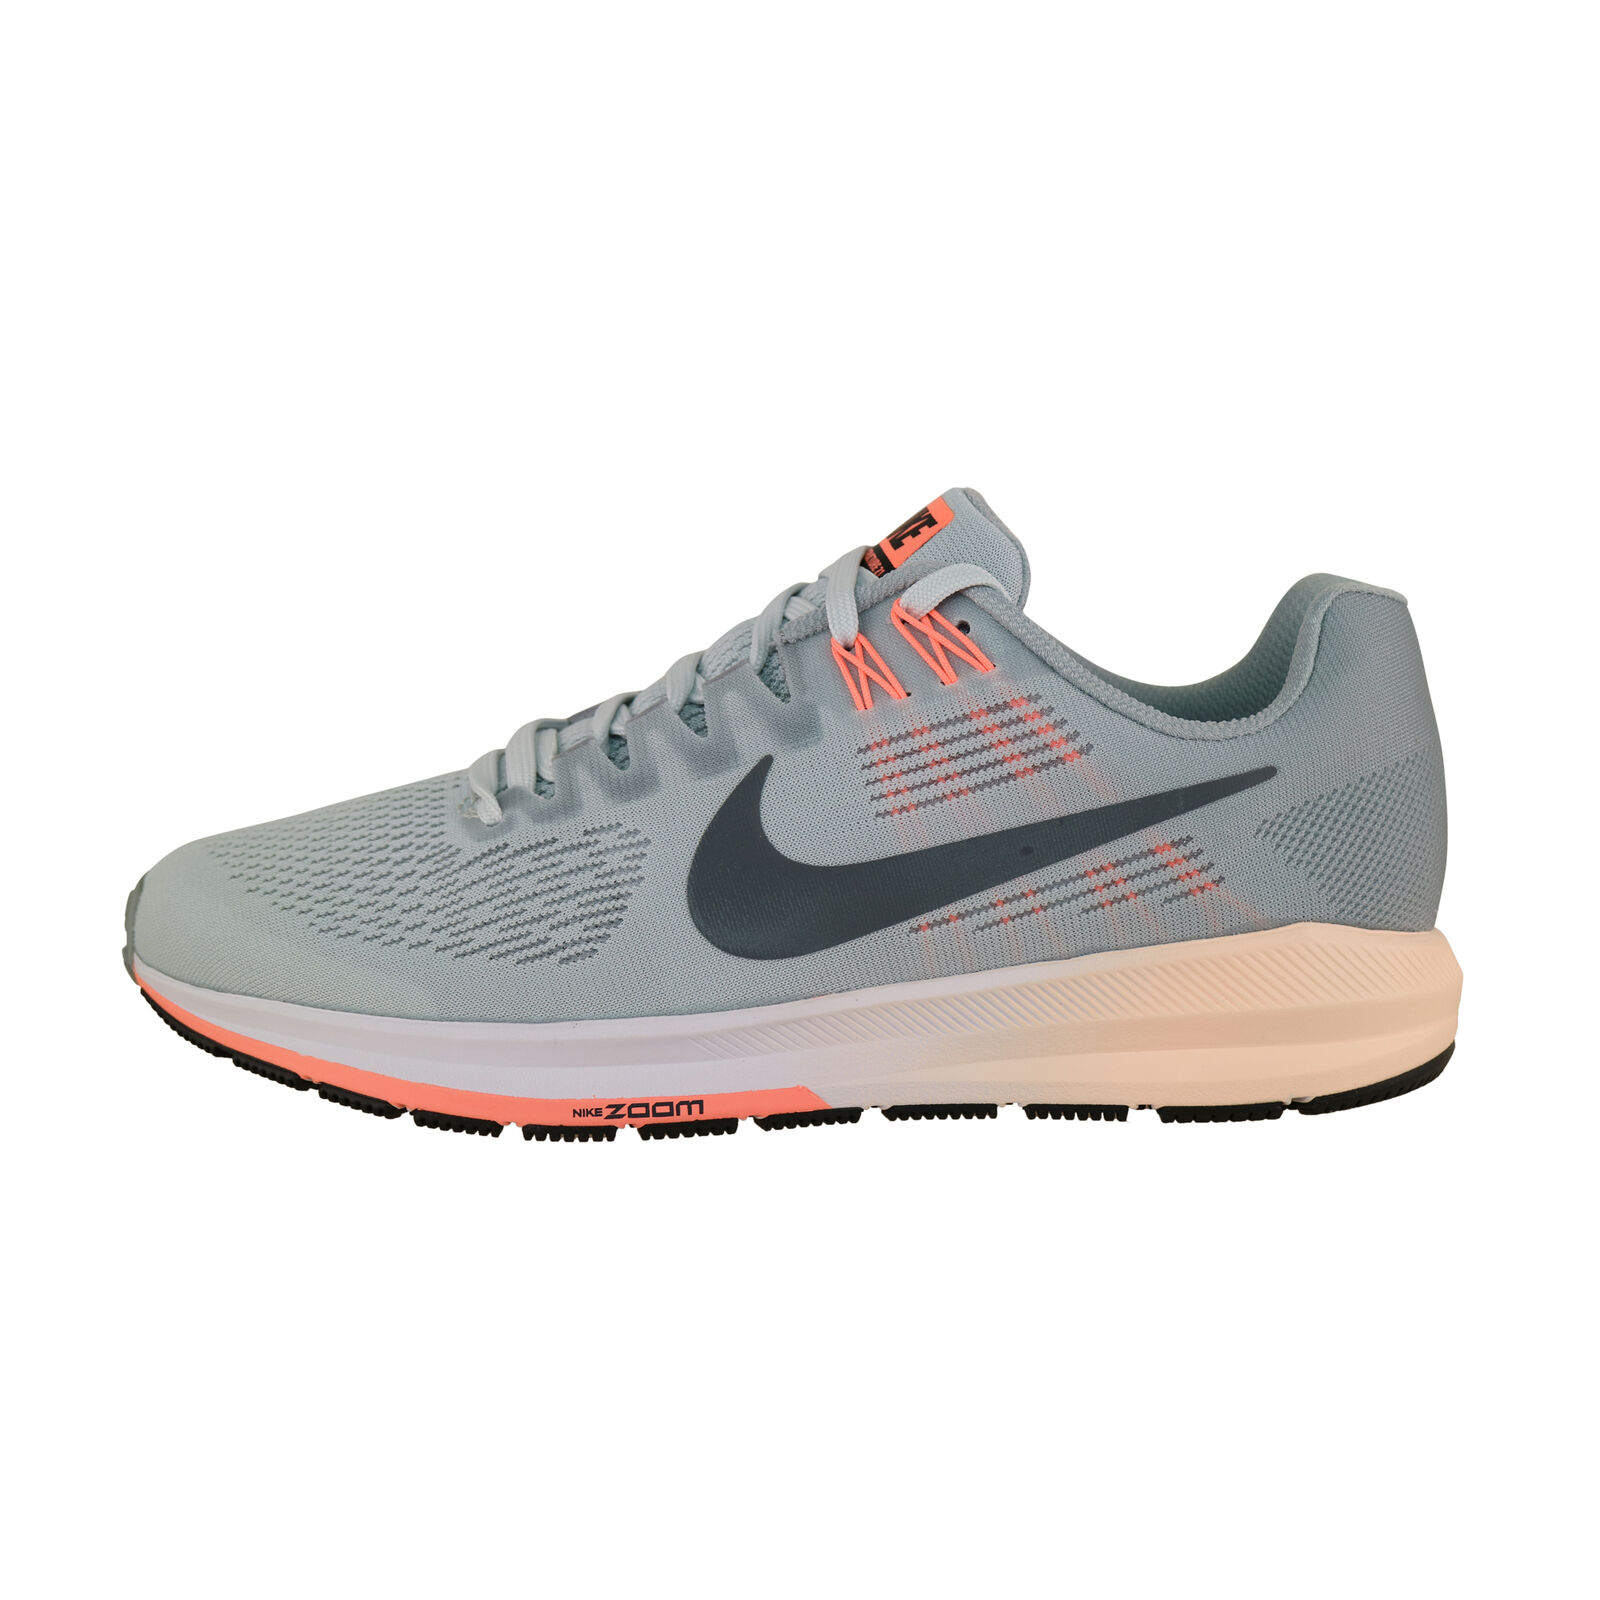 Nike Air Zoom Struktur 21 DaSie -stabile Laufschuhe 904701 -008